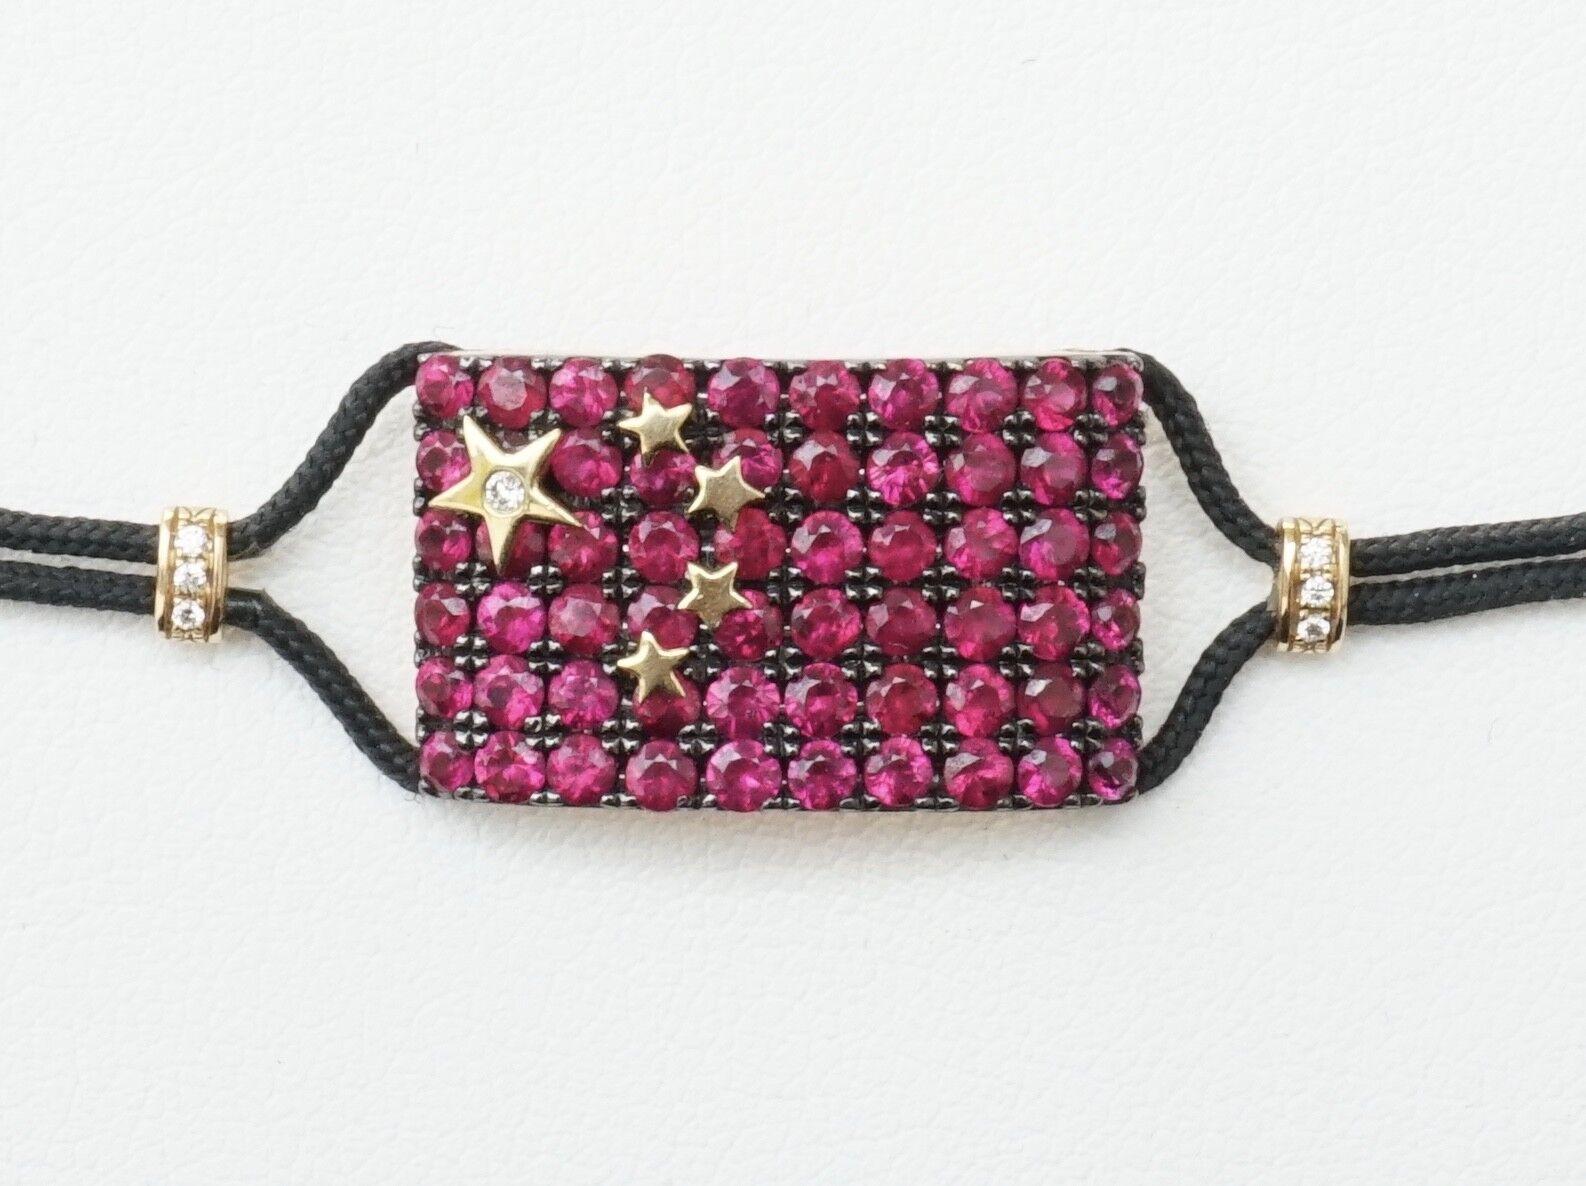 NEW 18K Yellow gold Pippo Perez Ruby & Diamond Corded Bracelet